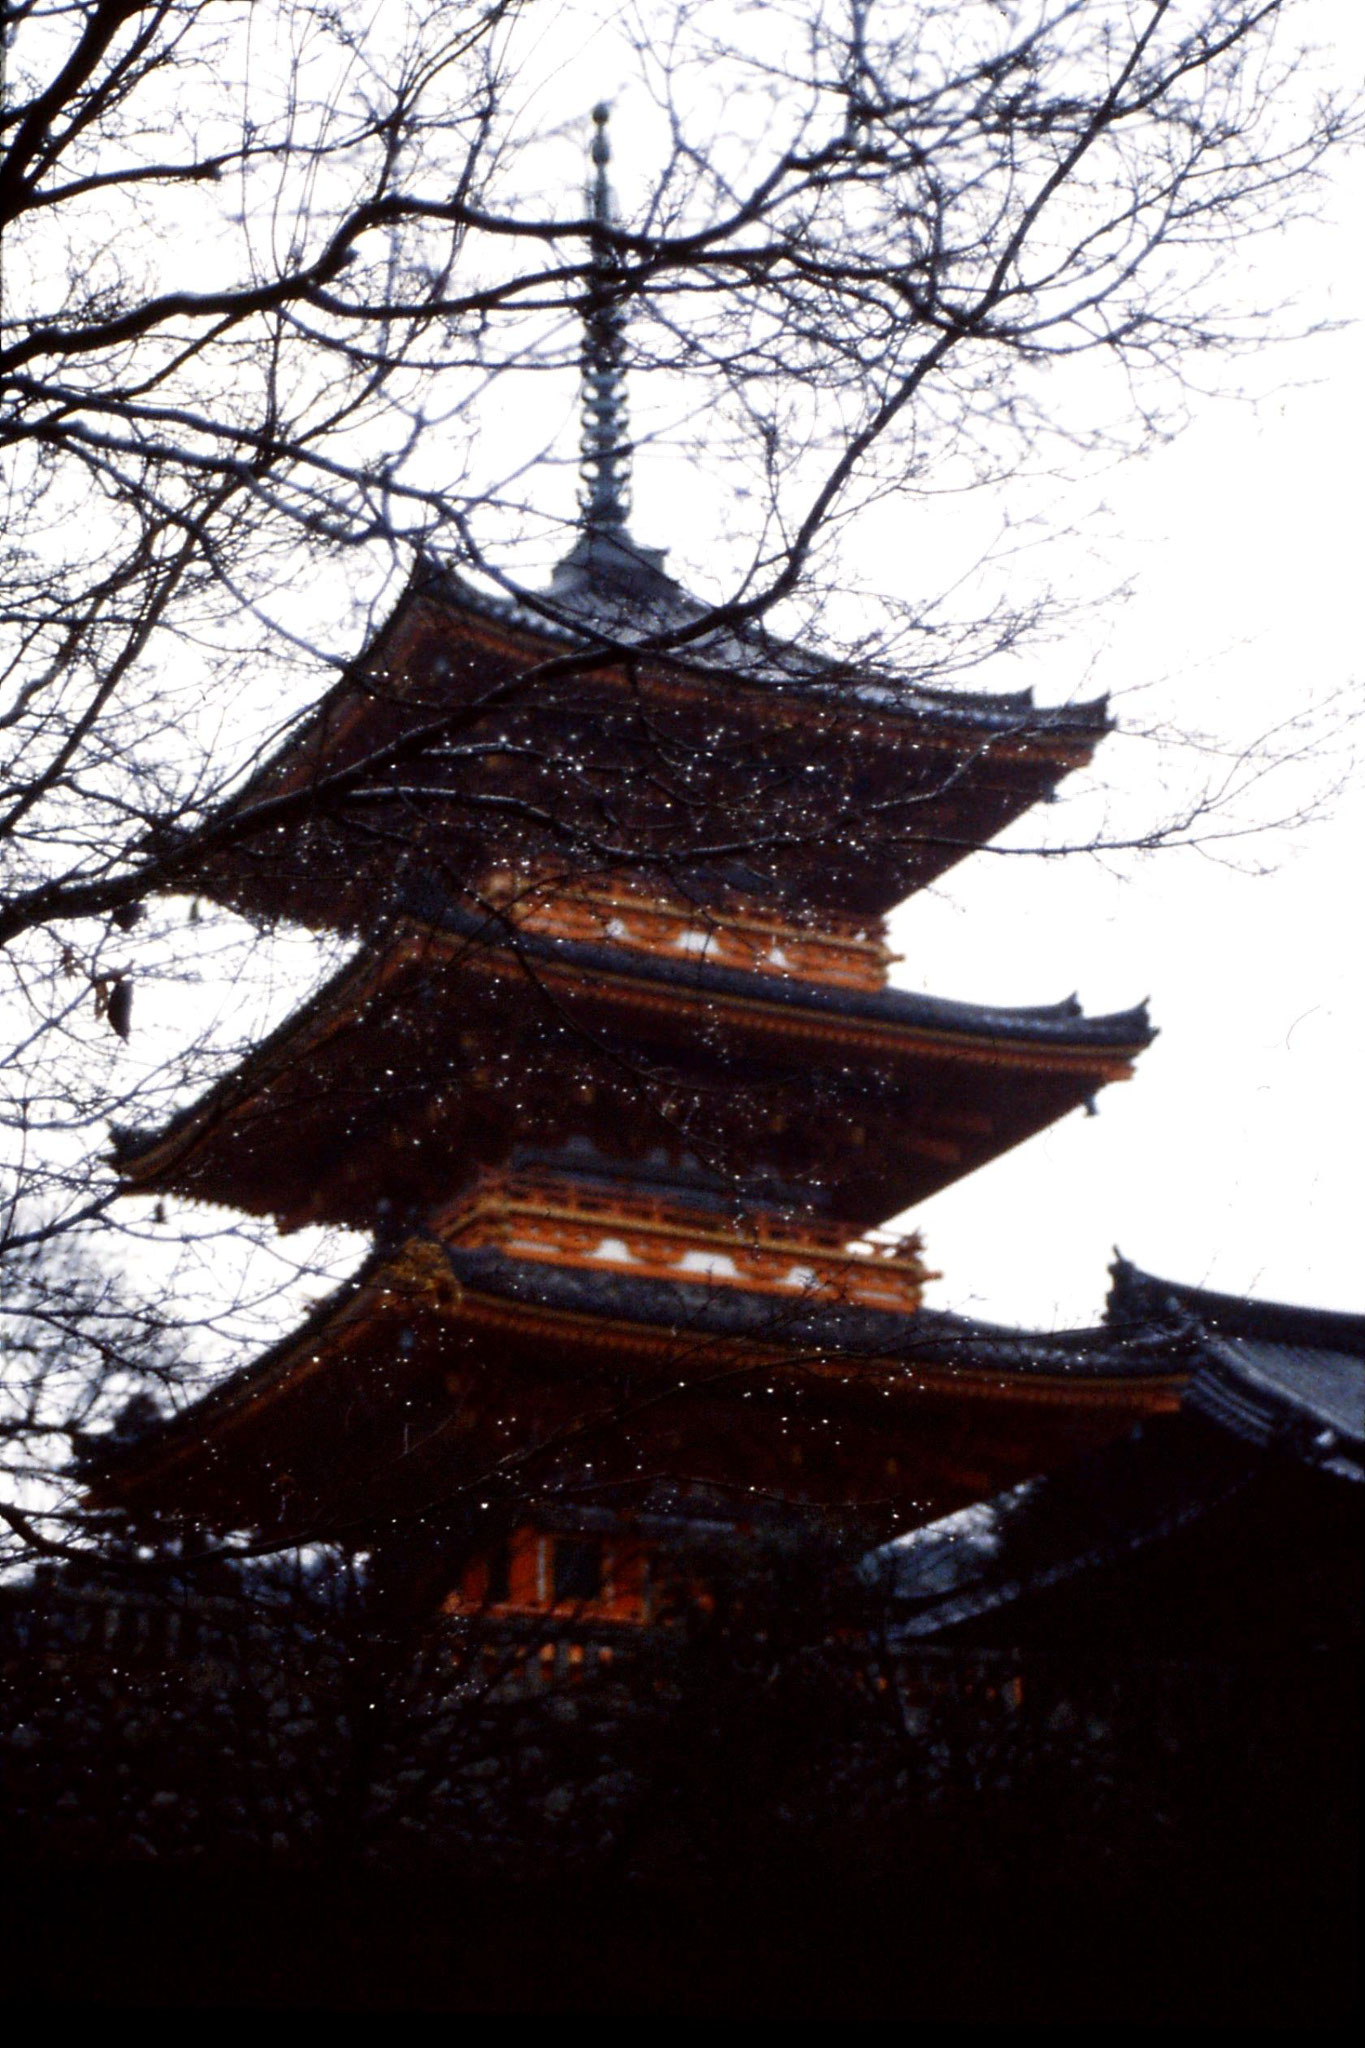 26/1/1989: 8: Kyoto